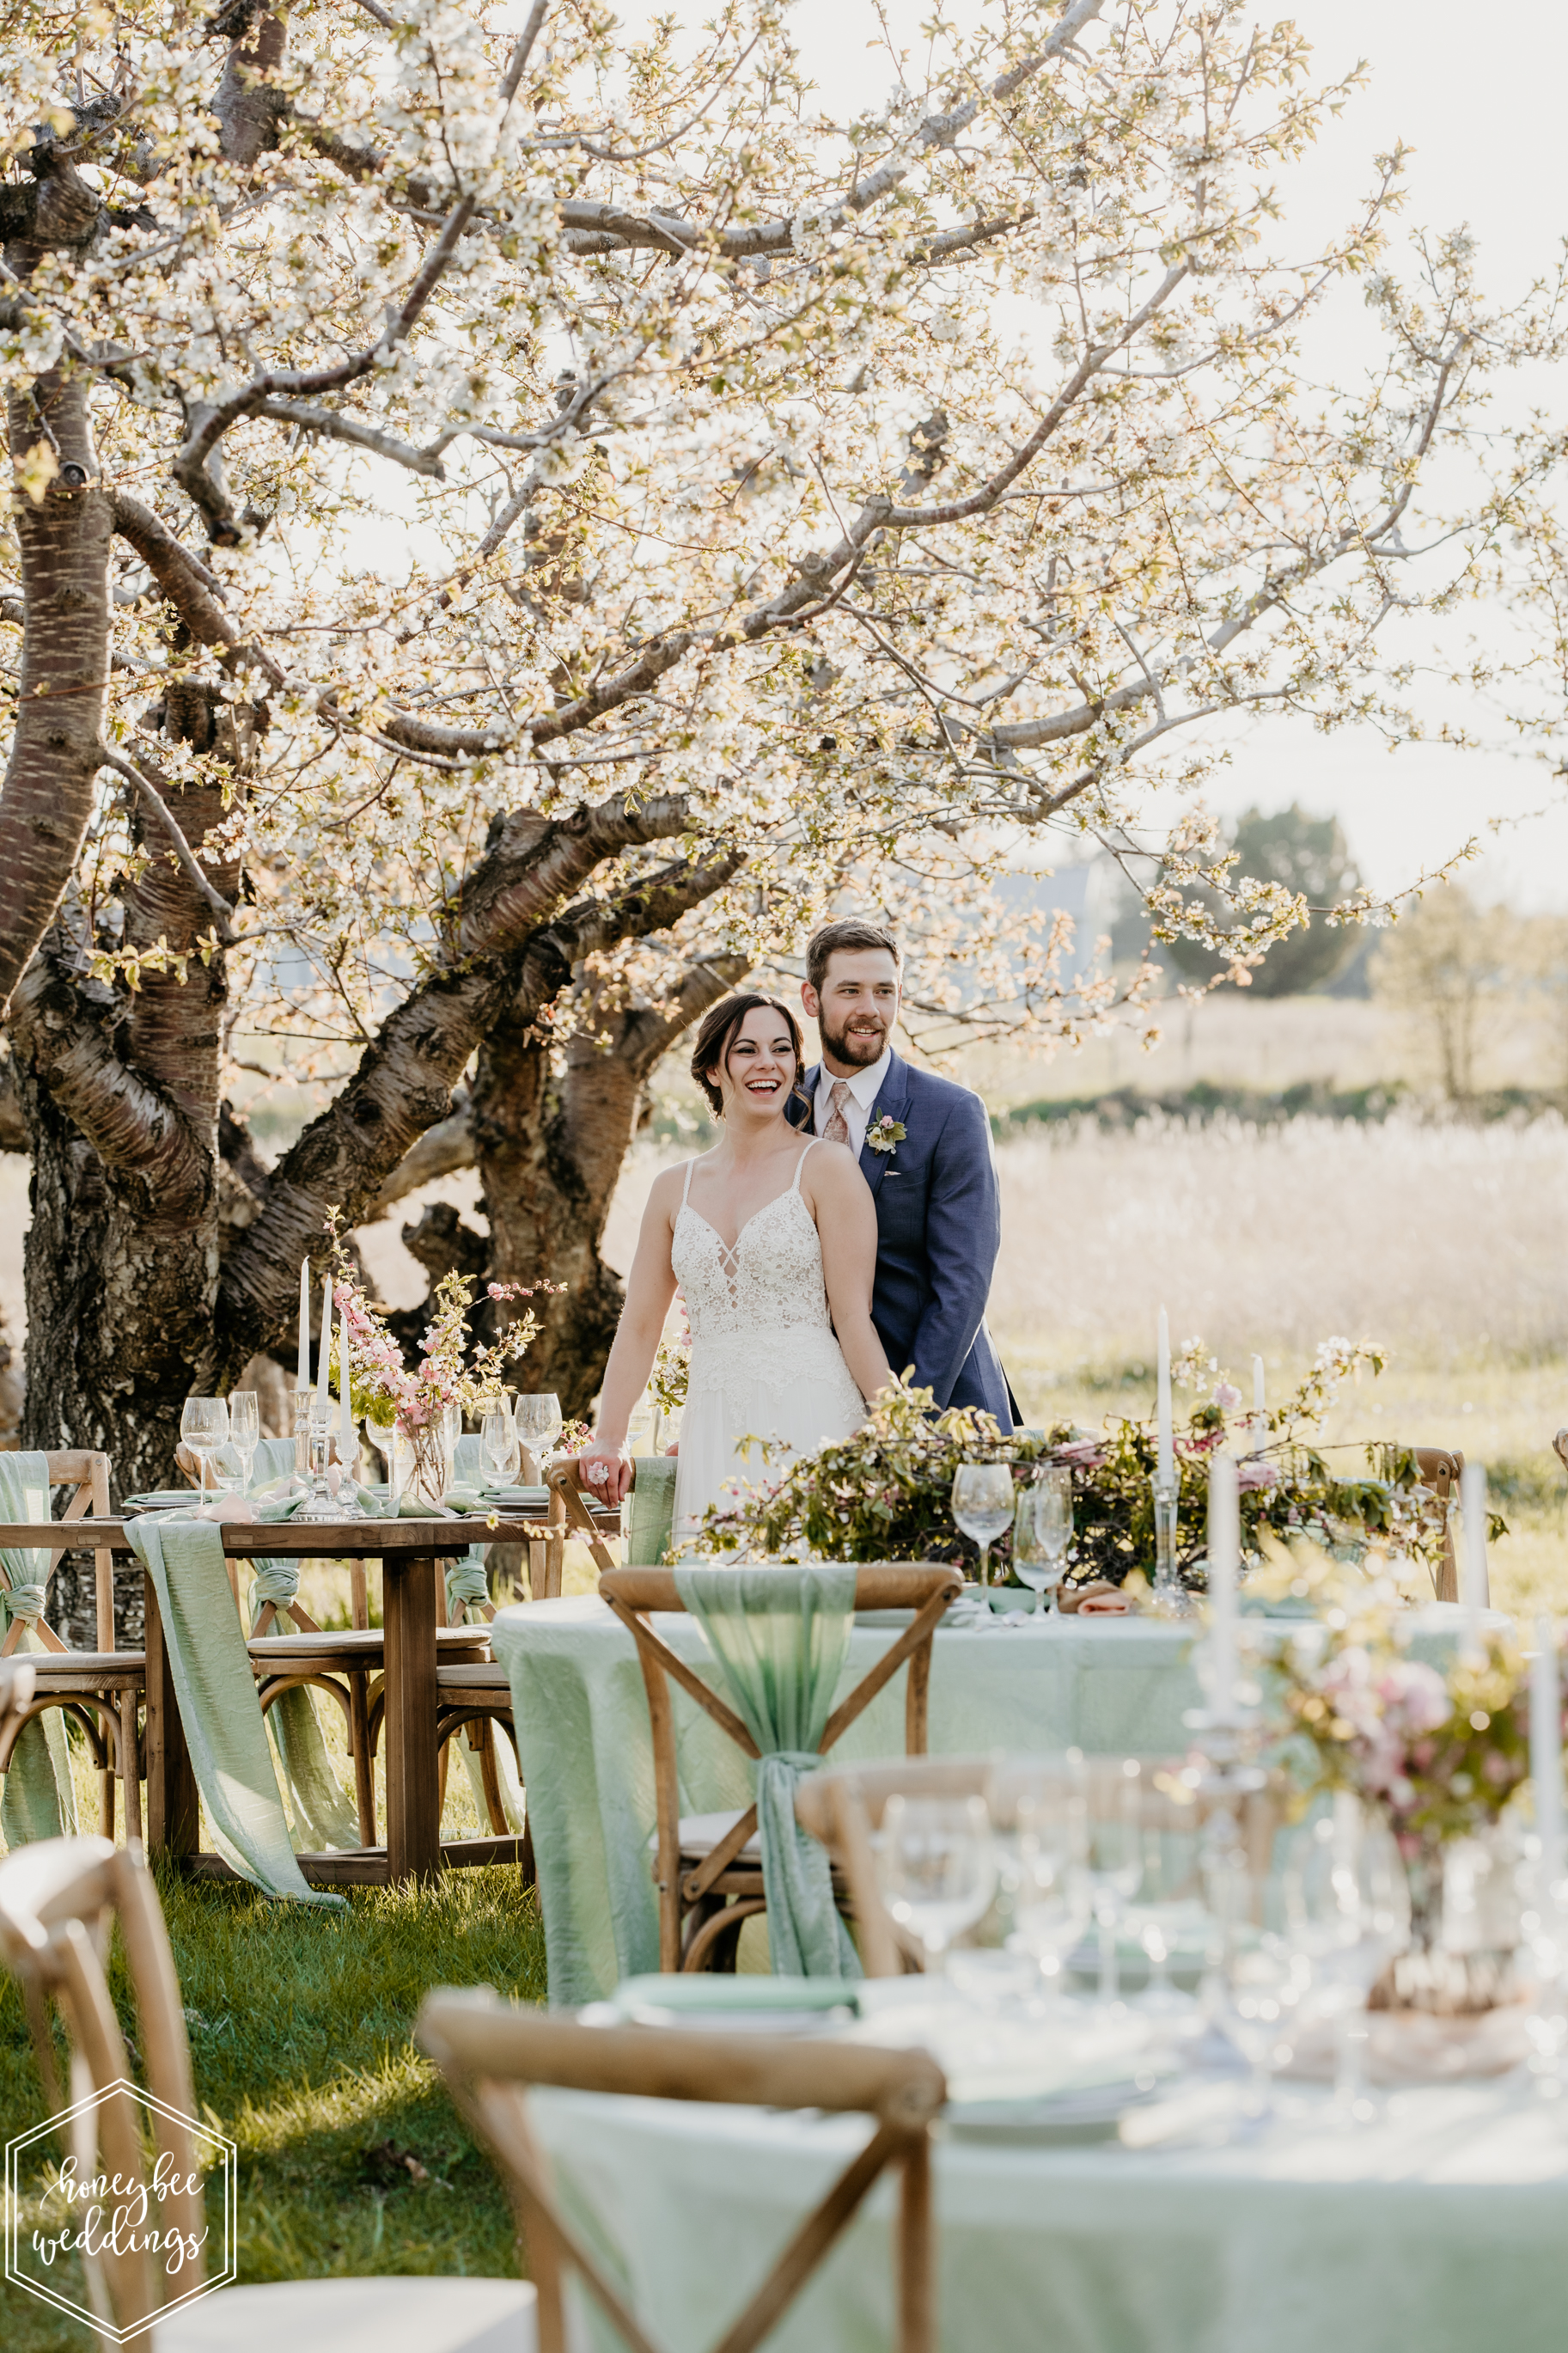 129Cherry Blossom Wedding_Styled Photoshoot_Honeybee Weddings_May 11, 2019-610.jpg